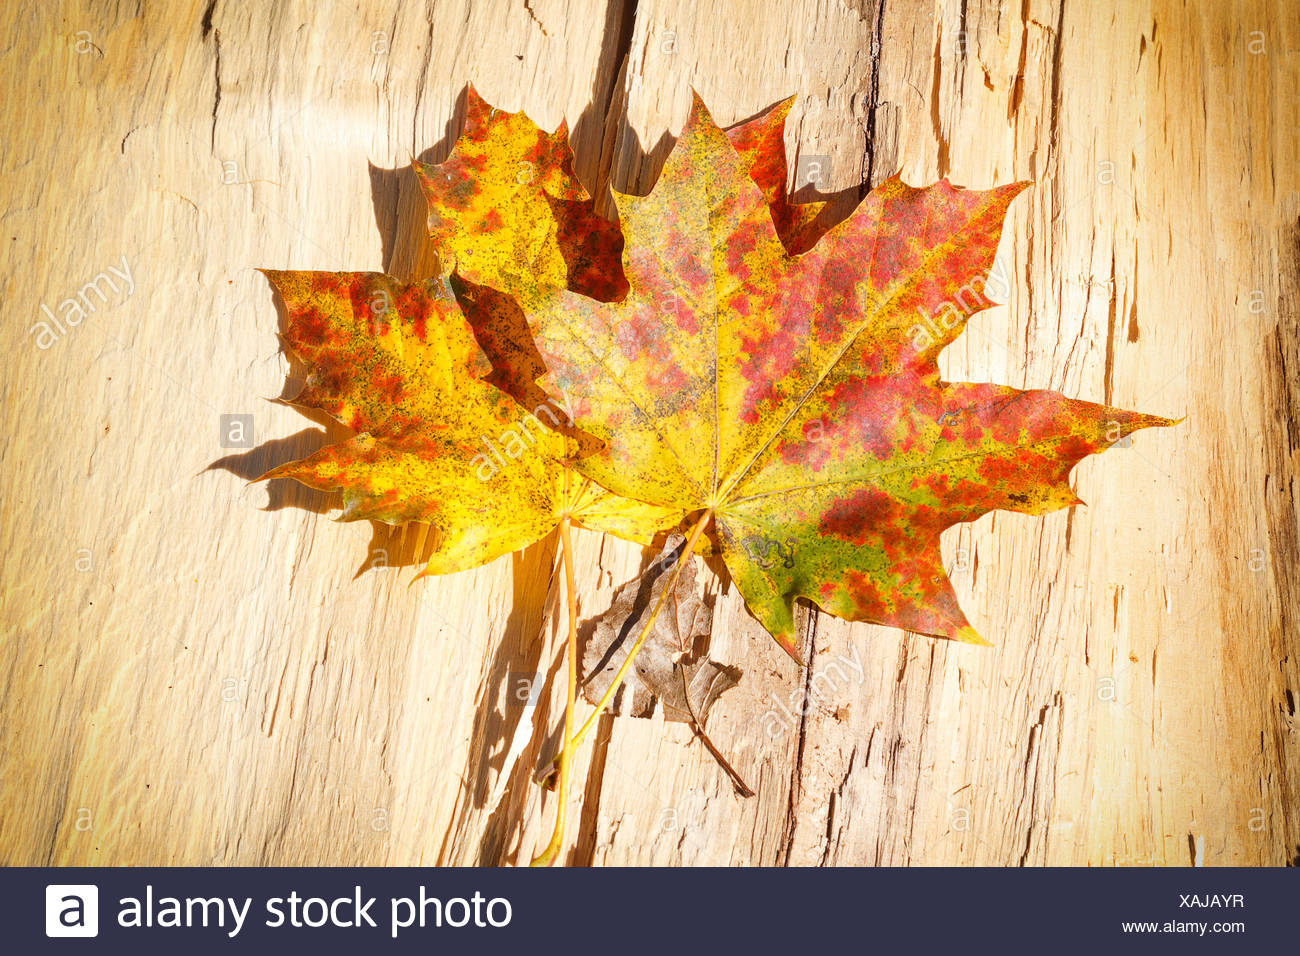 backdrop background fall autumn leaf detail art colour model